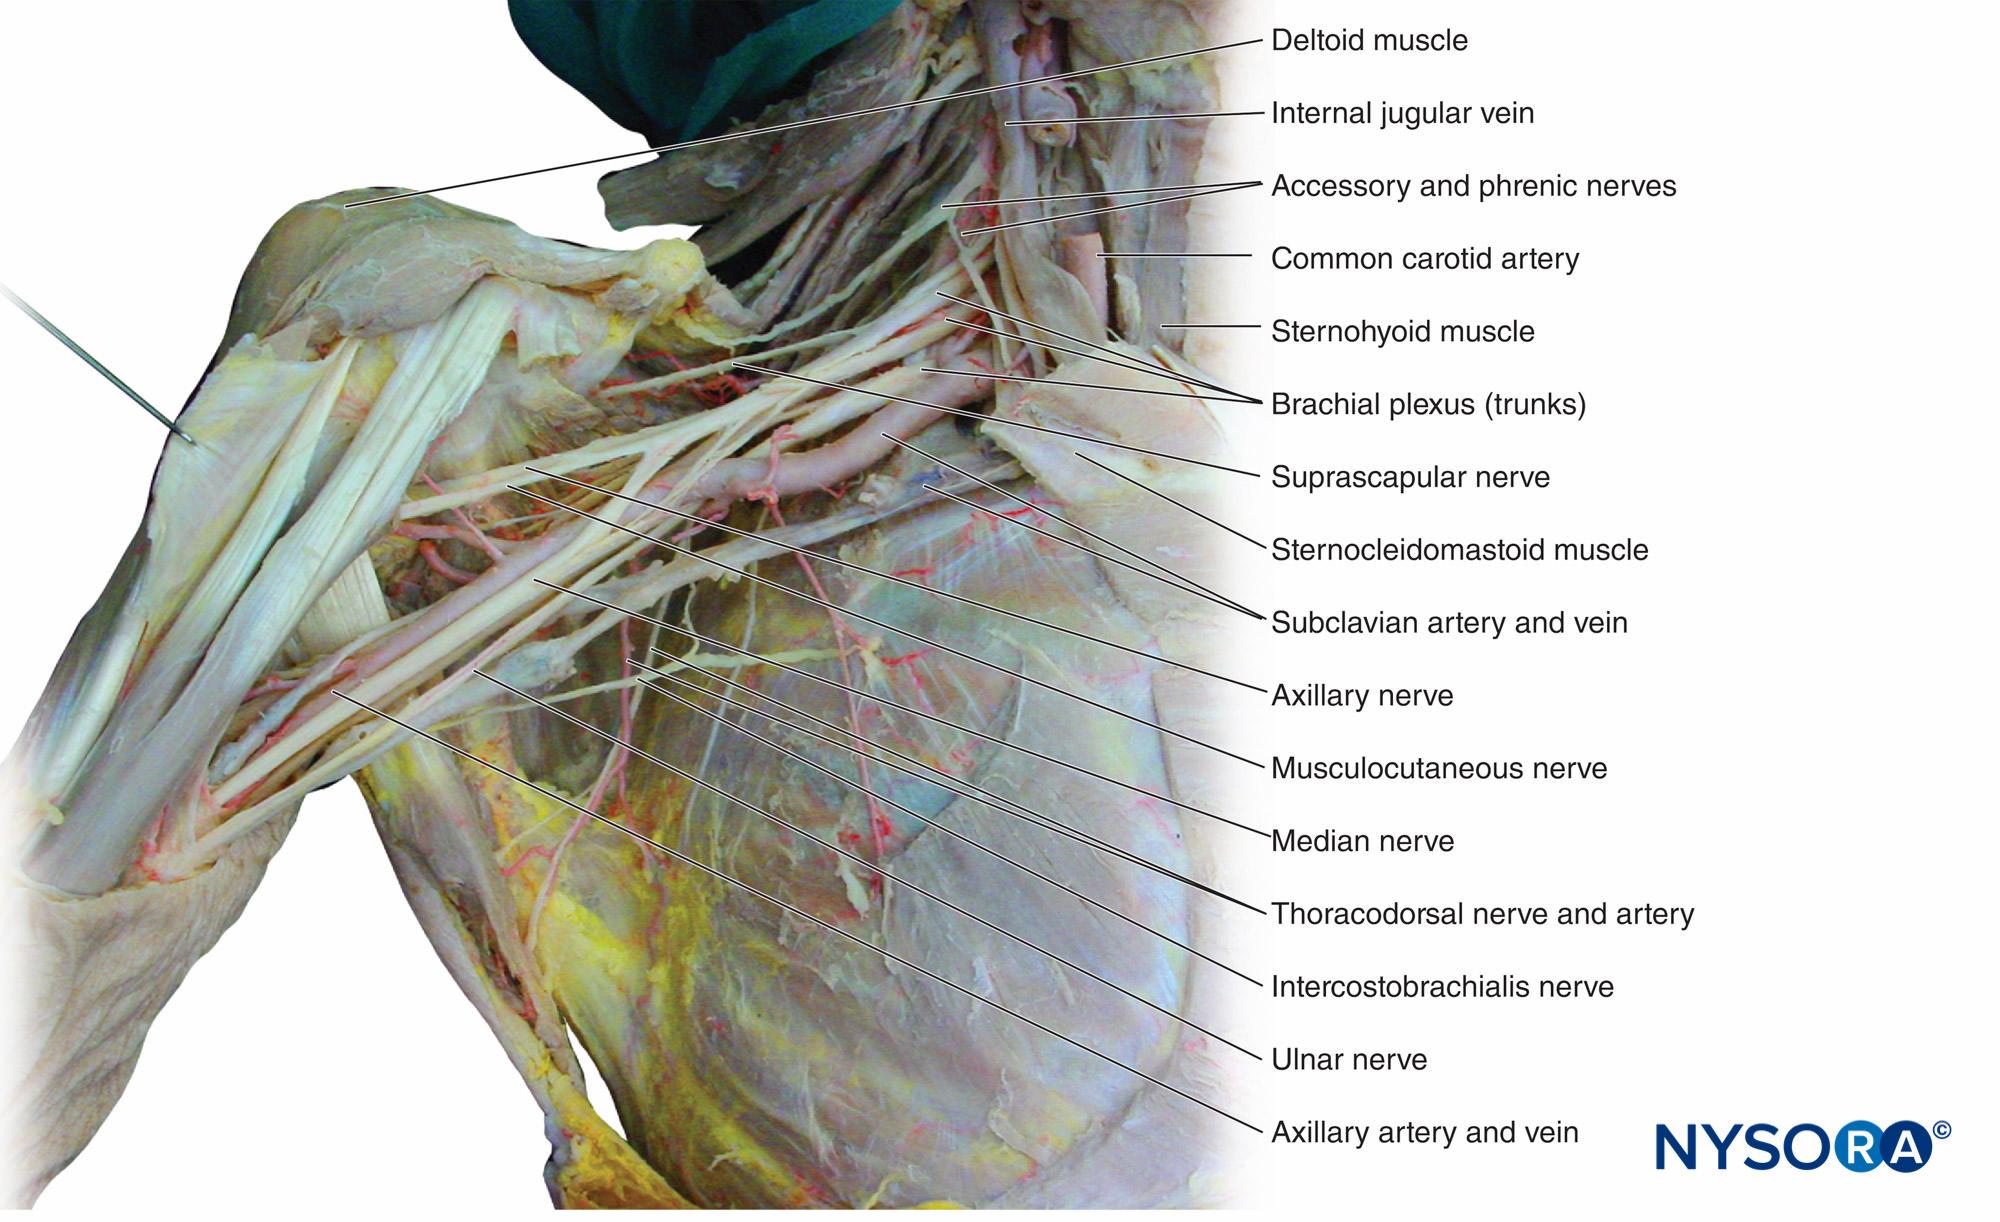 hight resolution of figure 12 dissection of the brachial plexus